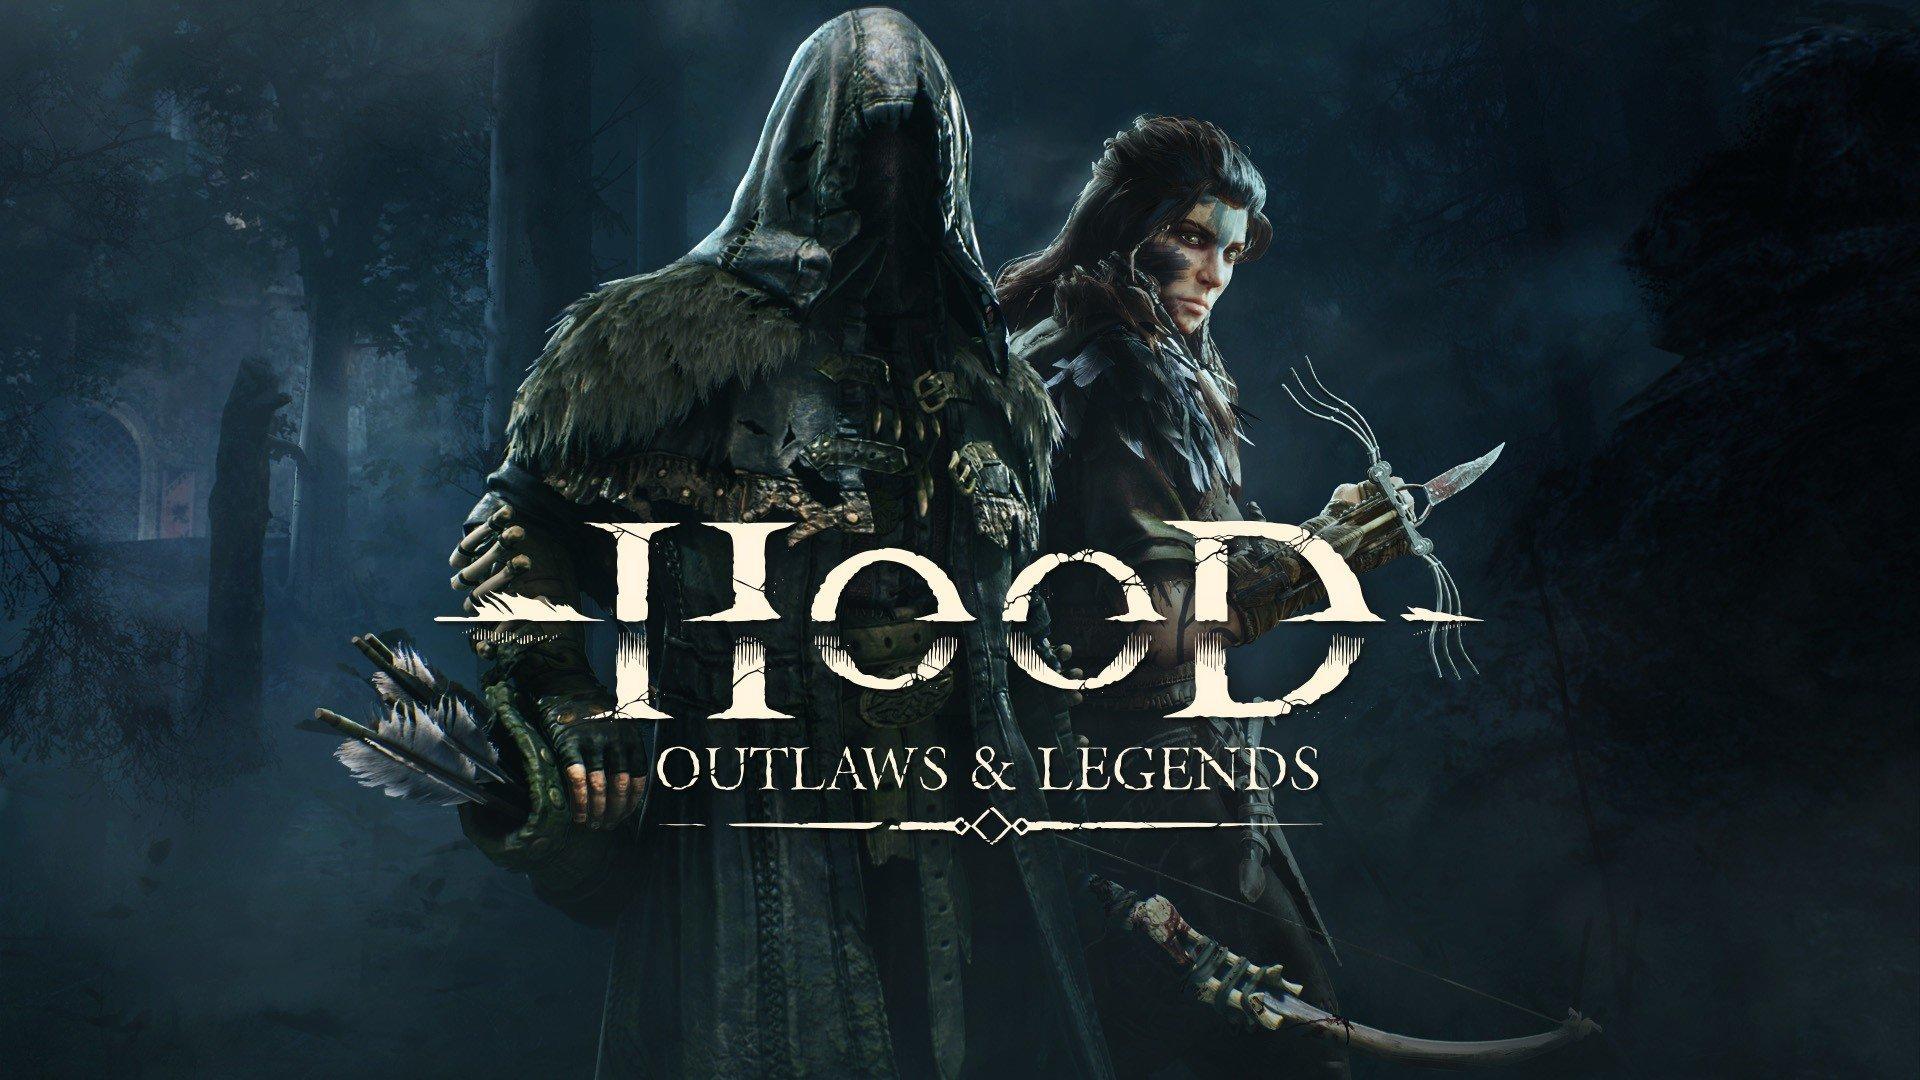 Вышел трейлер Hood Outlaws Legendsс элементами геймплея